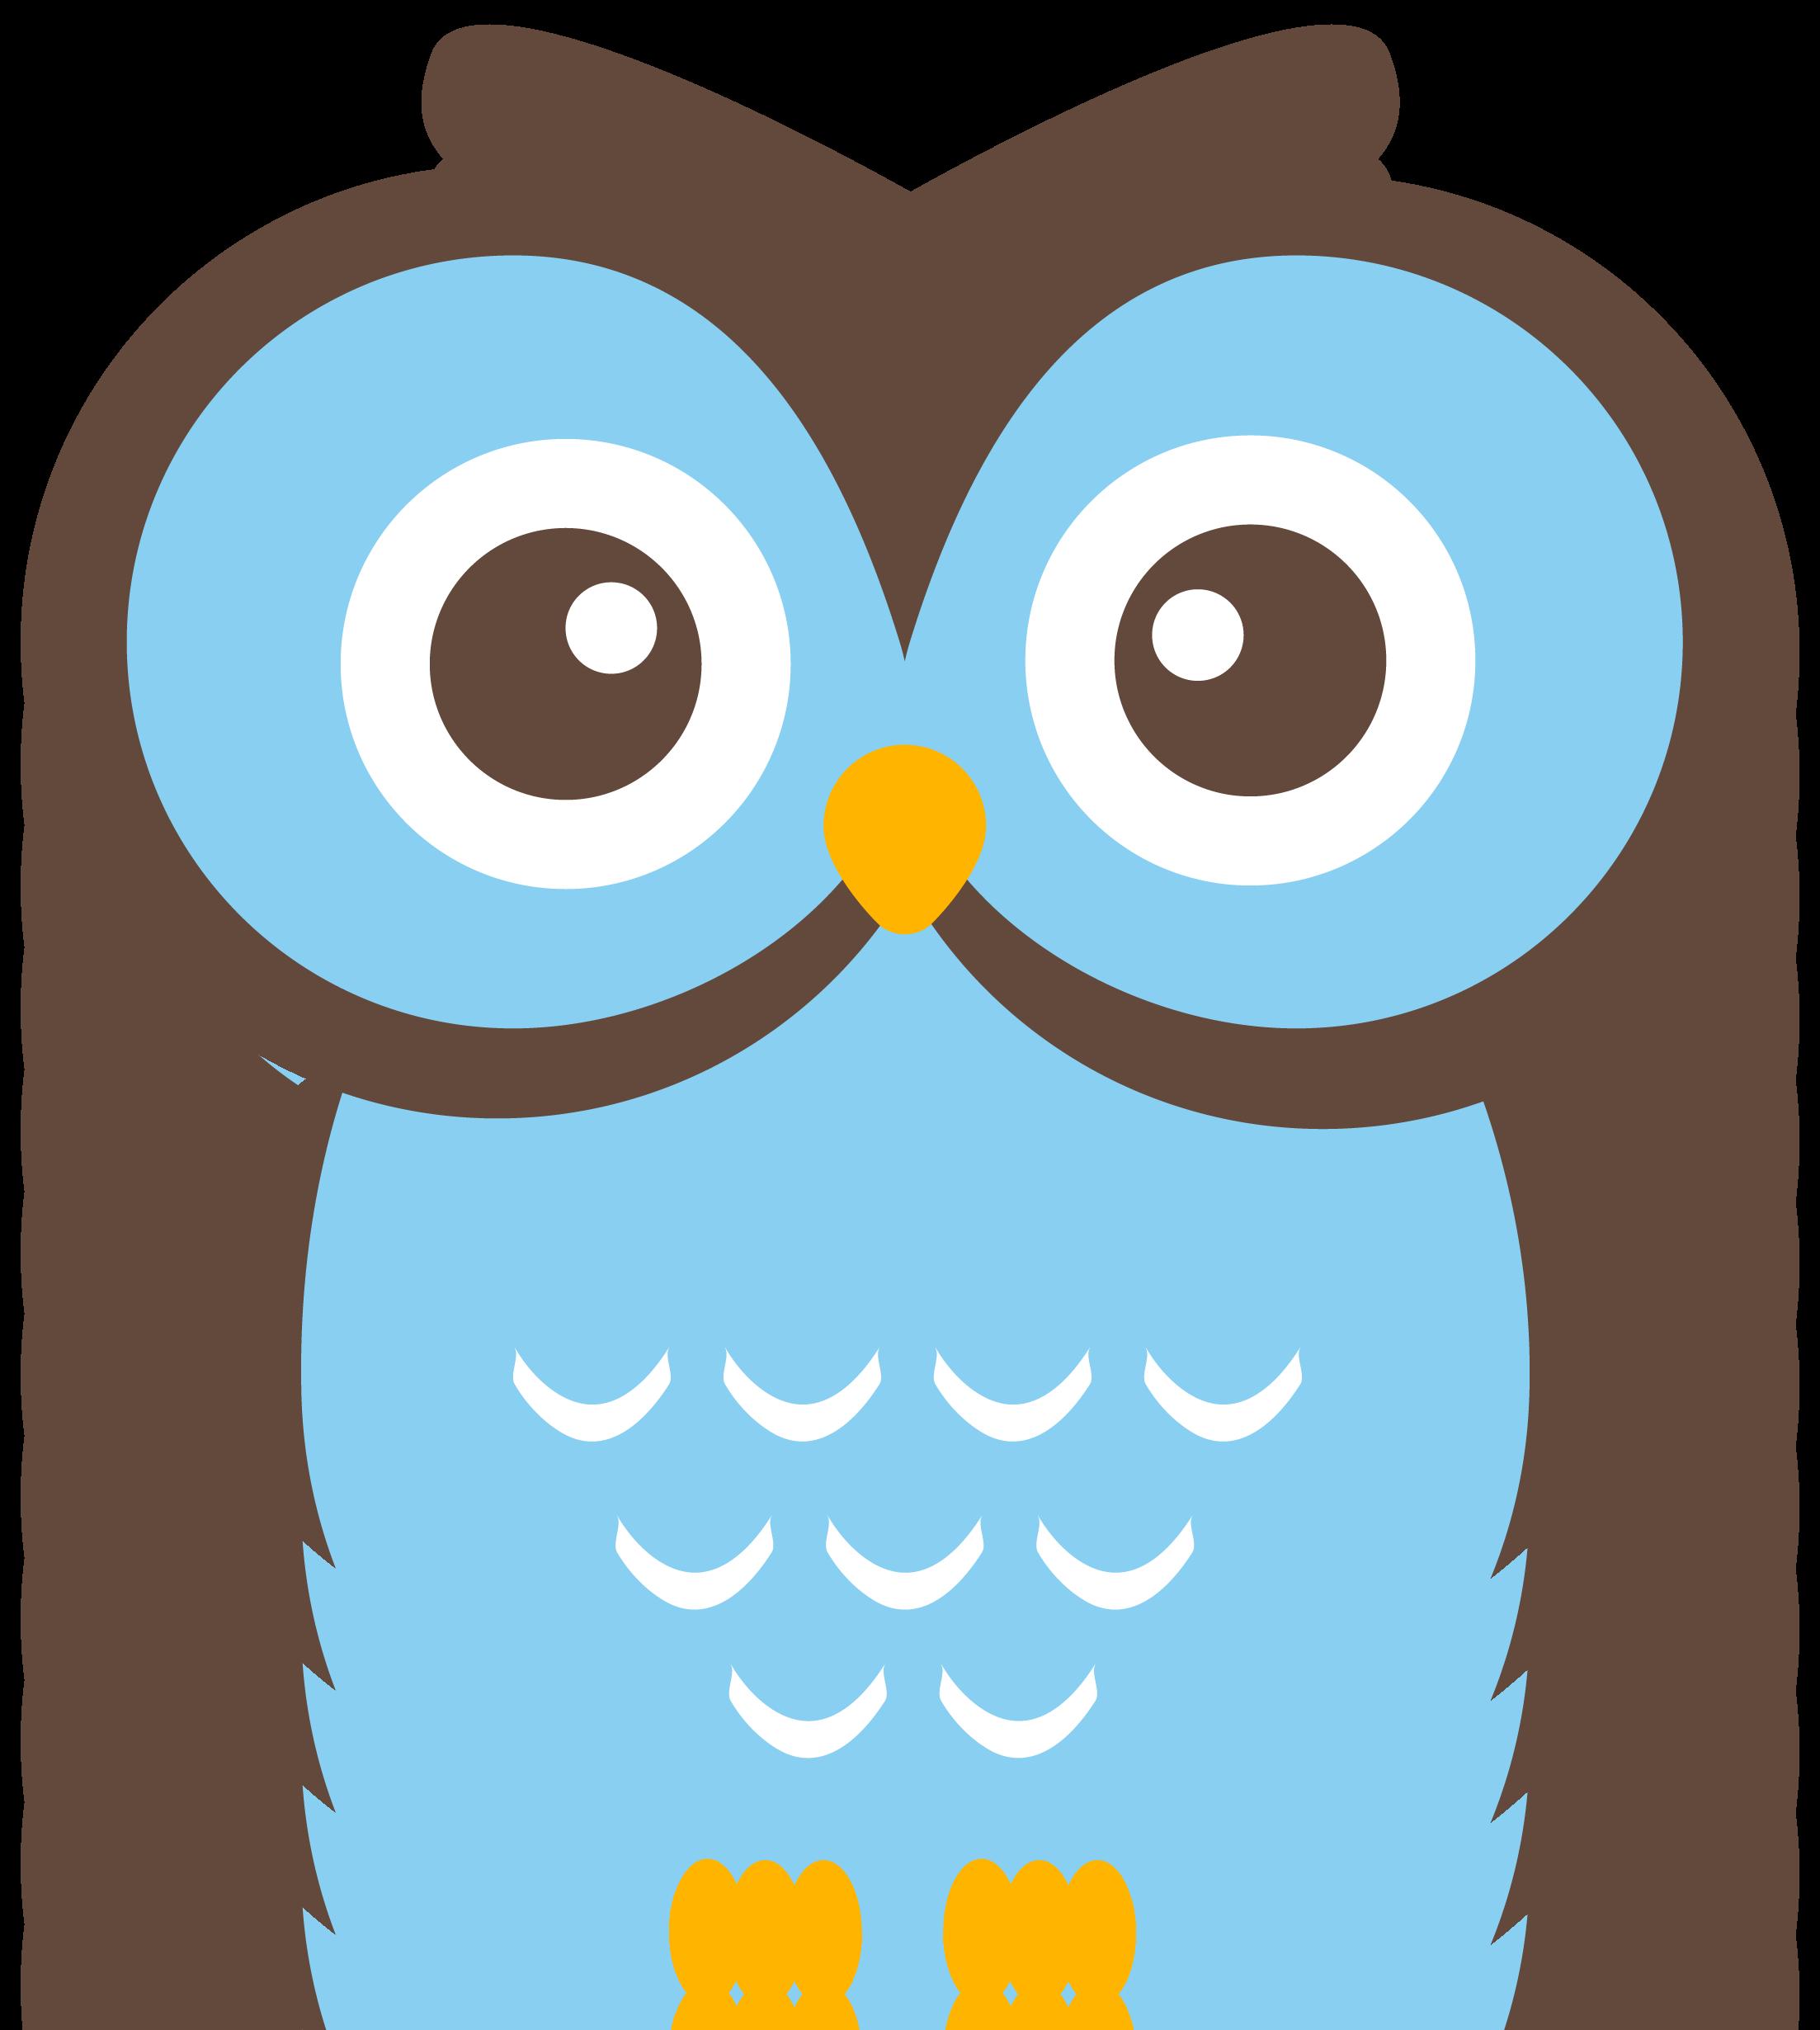 Free Cartoon Owl Clipart Image-Free cartoon owl clipart image-9